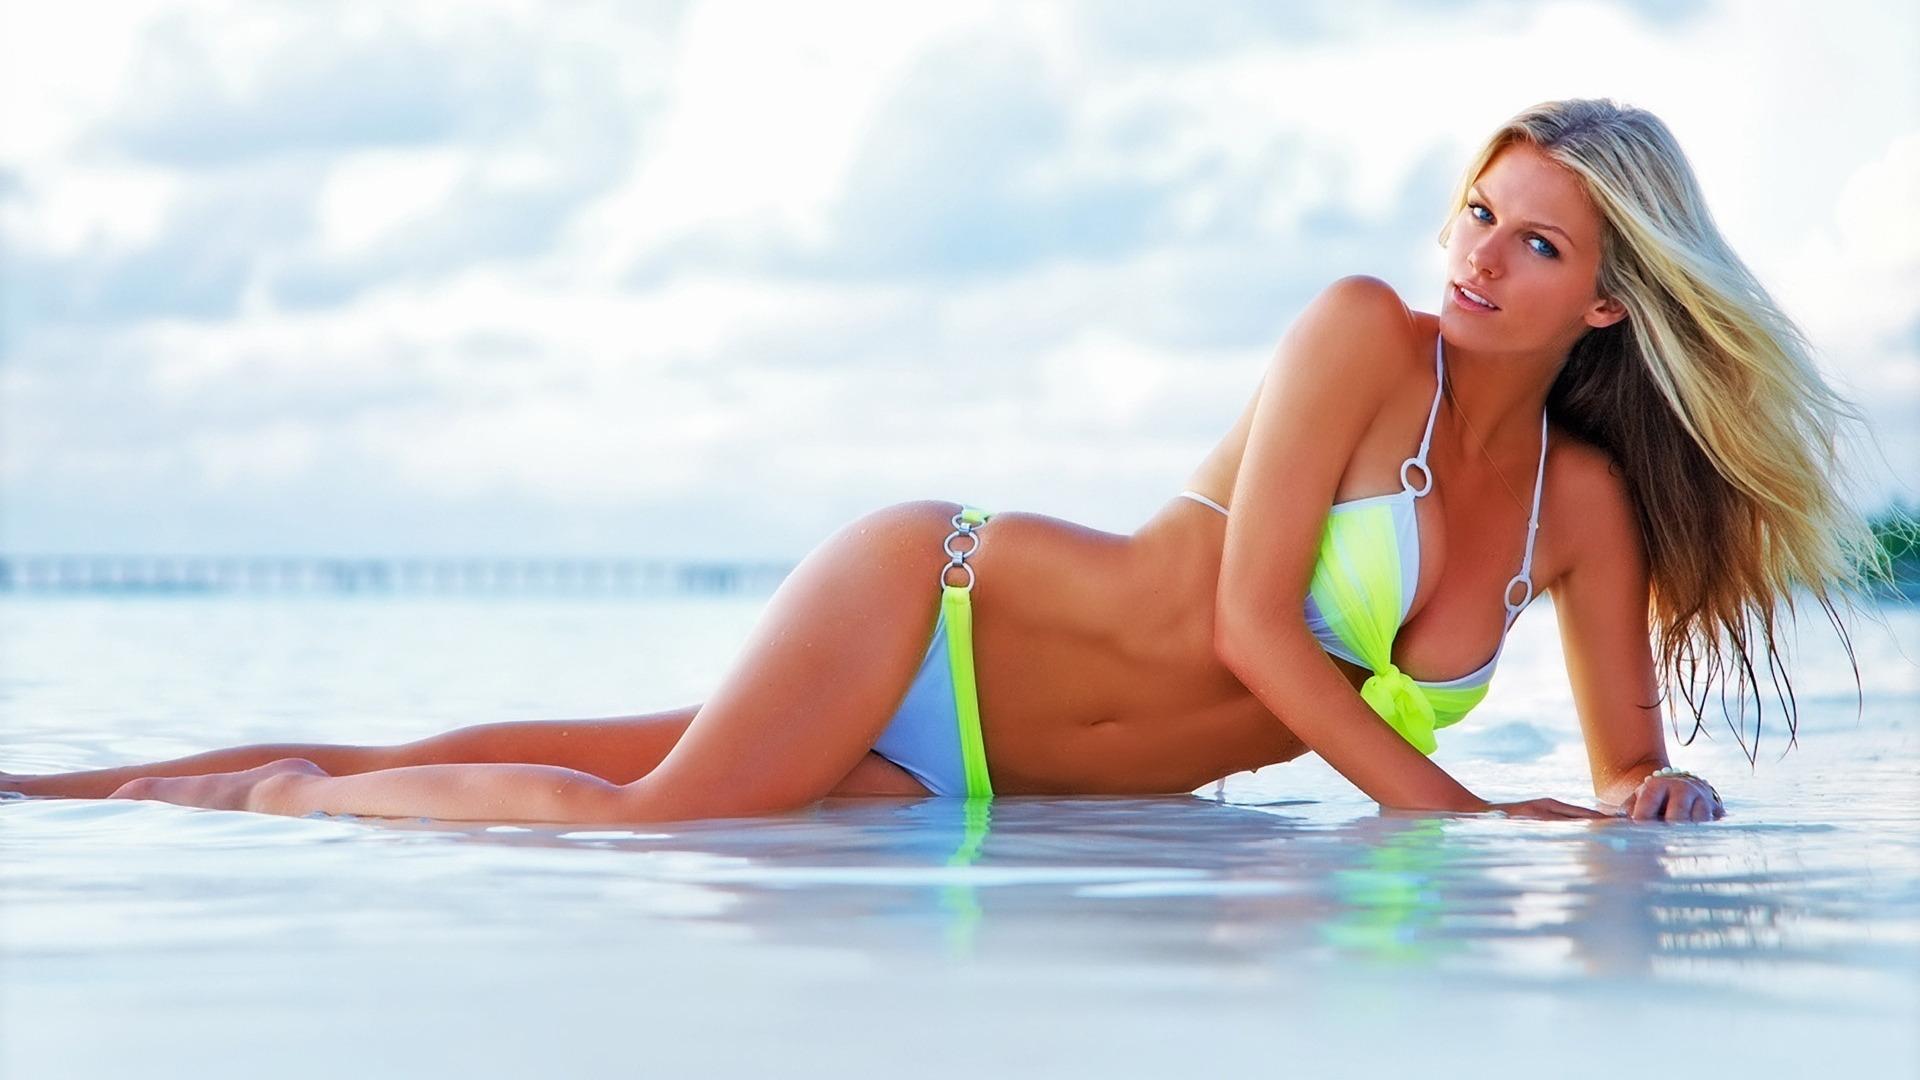 hot-bikini-girls-wallpaper-older-mature-milf-videos